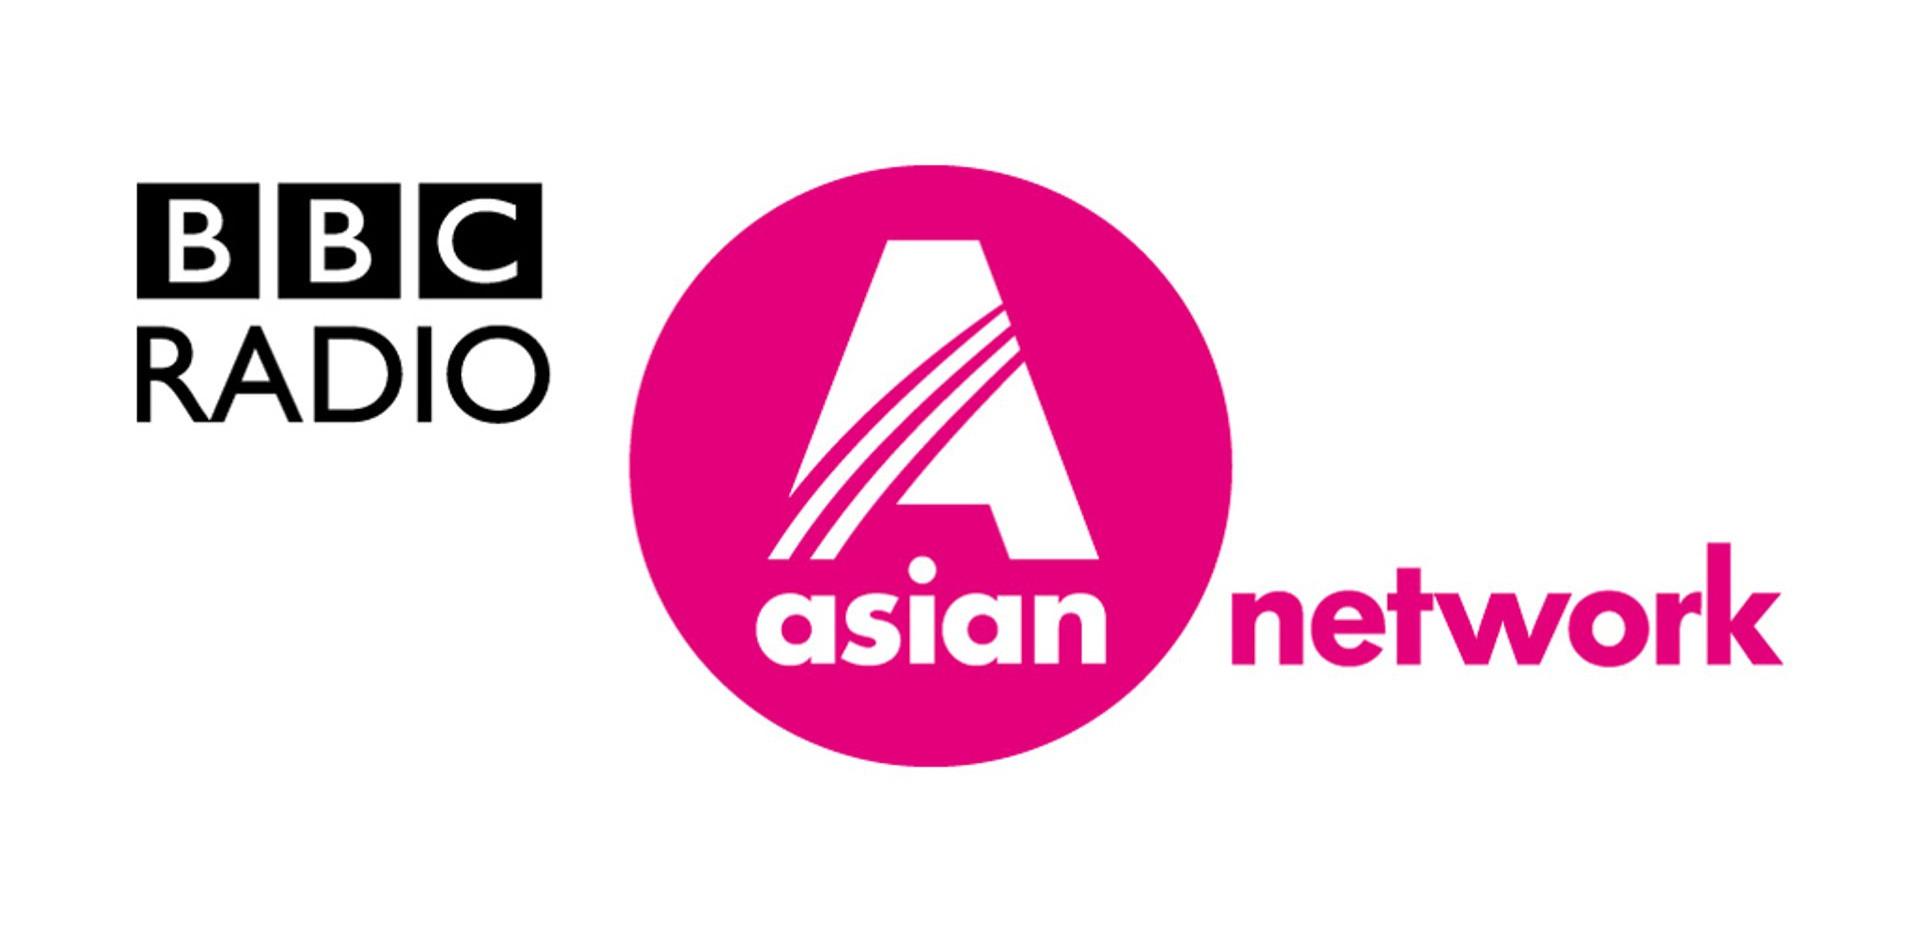 BBC ASIAN NETWORK LOGO.jpg